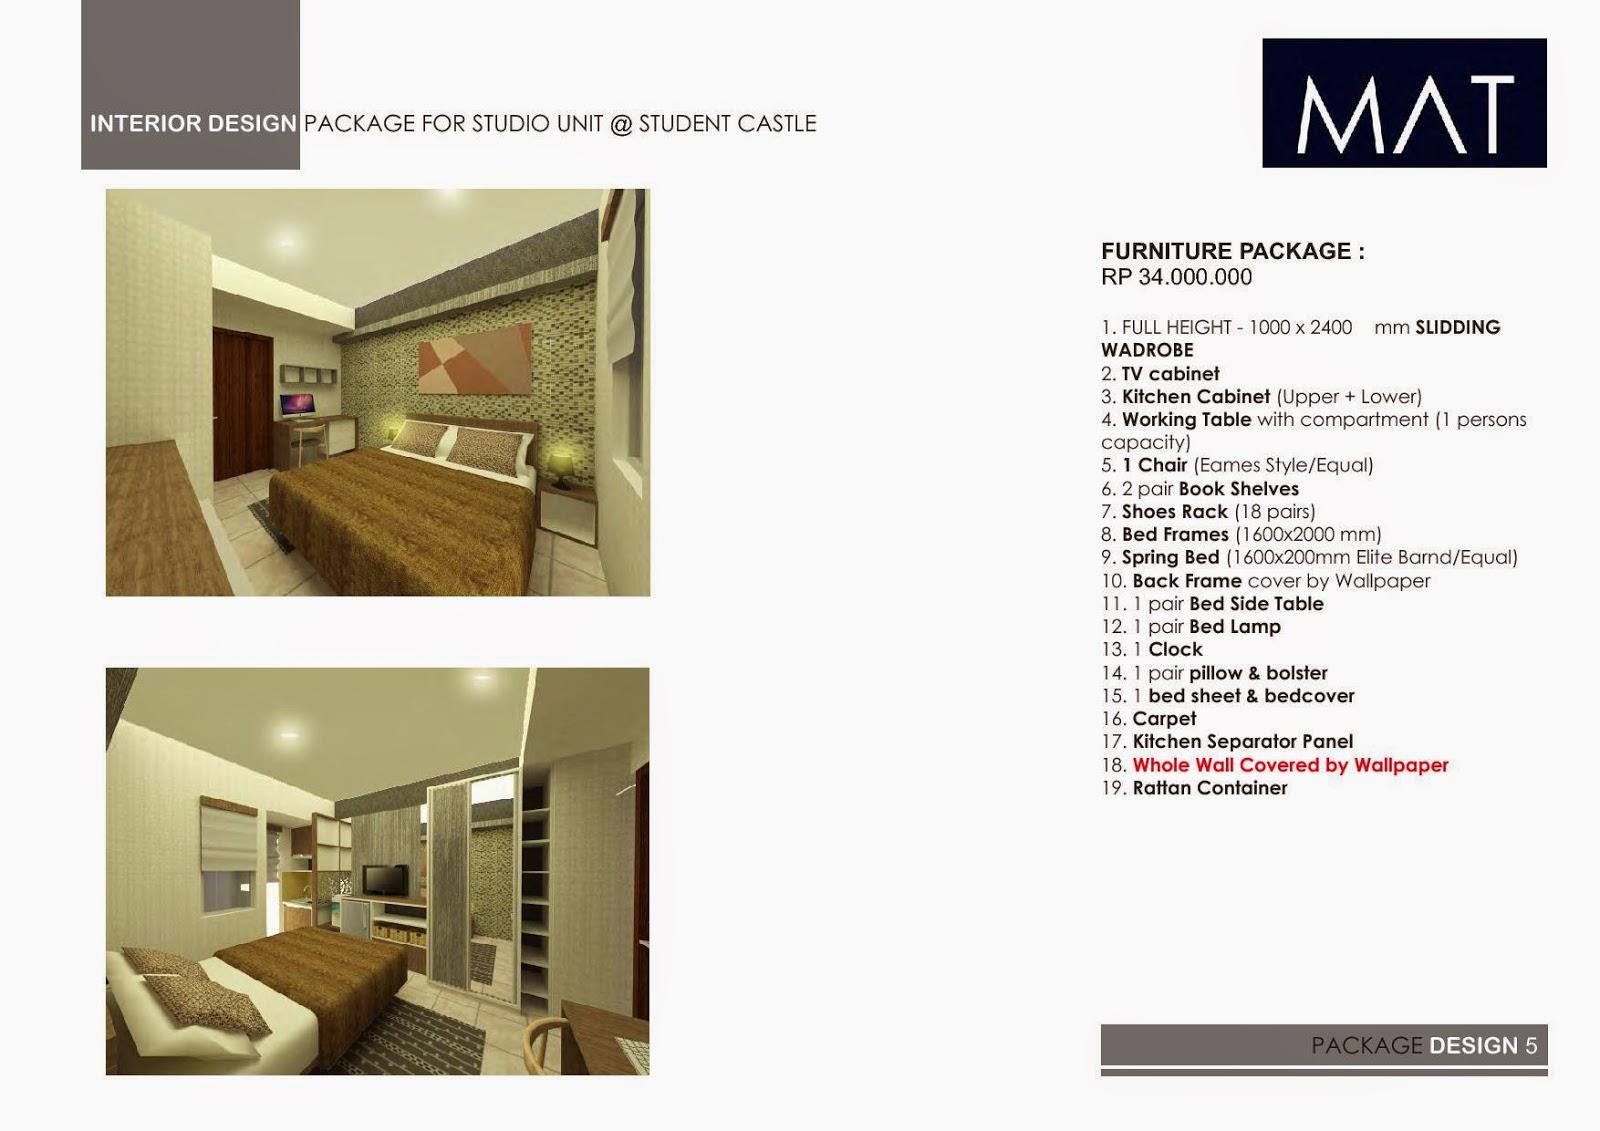 student castle apartment jogja 081326002999 : paketan interior